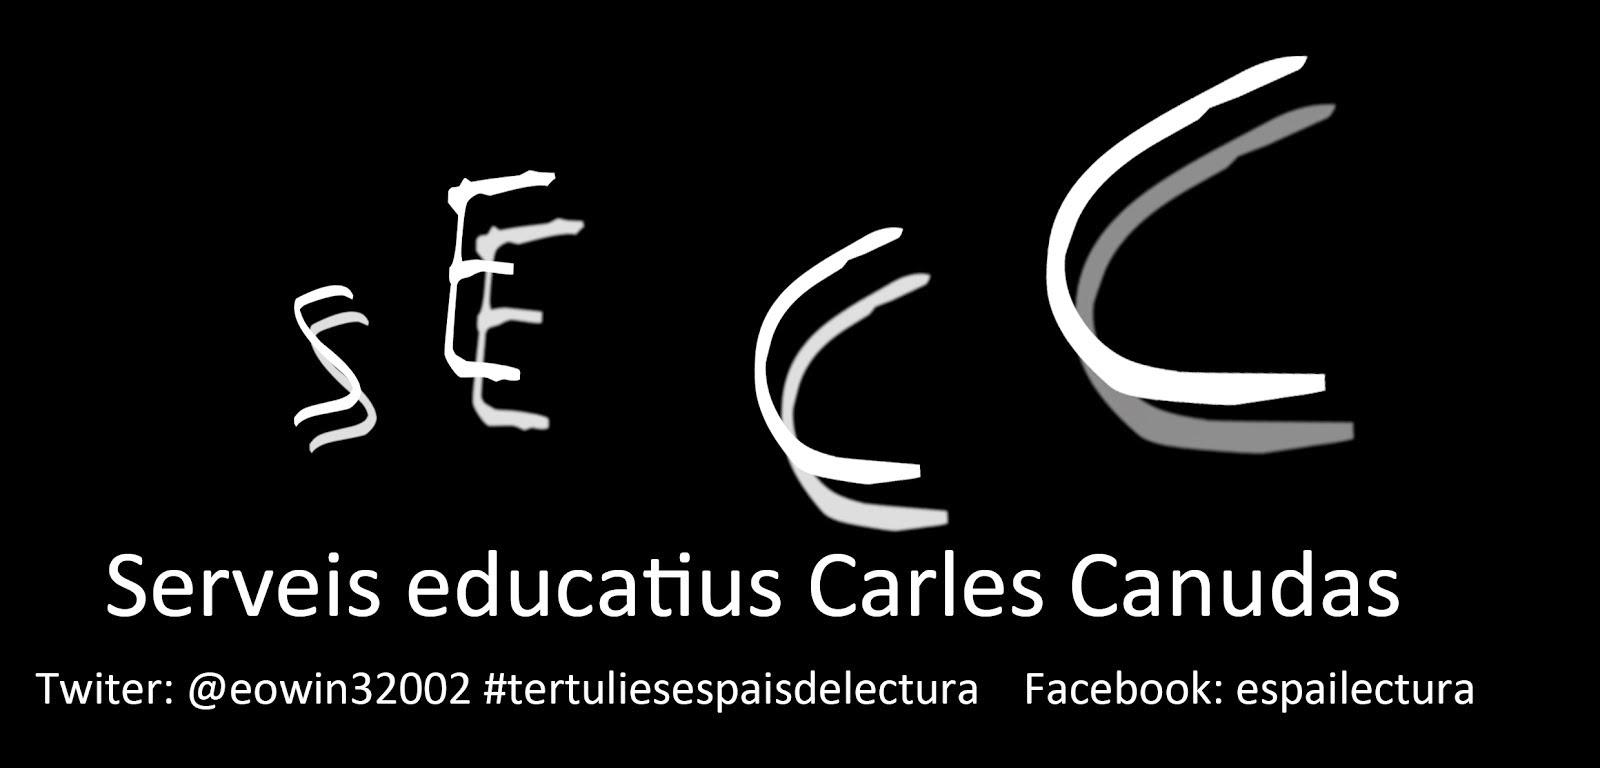 Serveis Educatius Carles Canudas